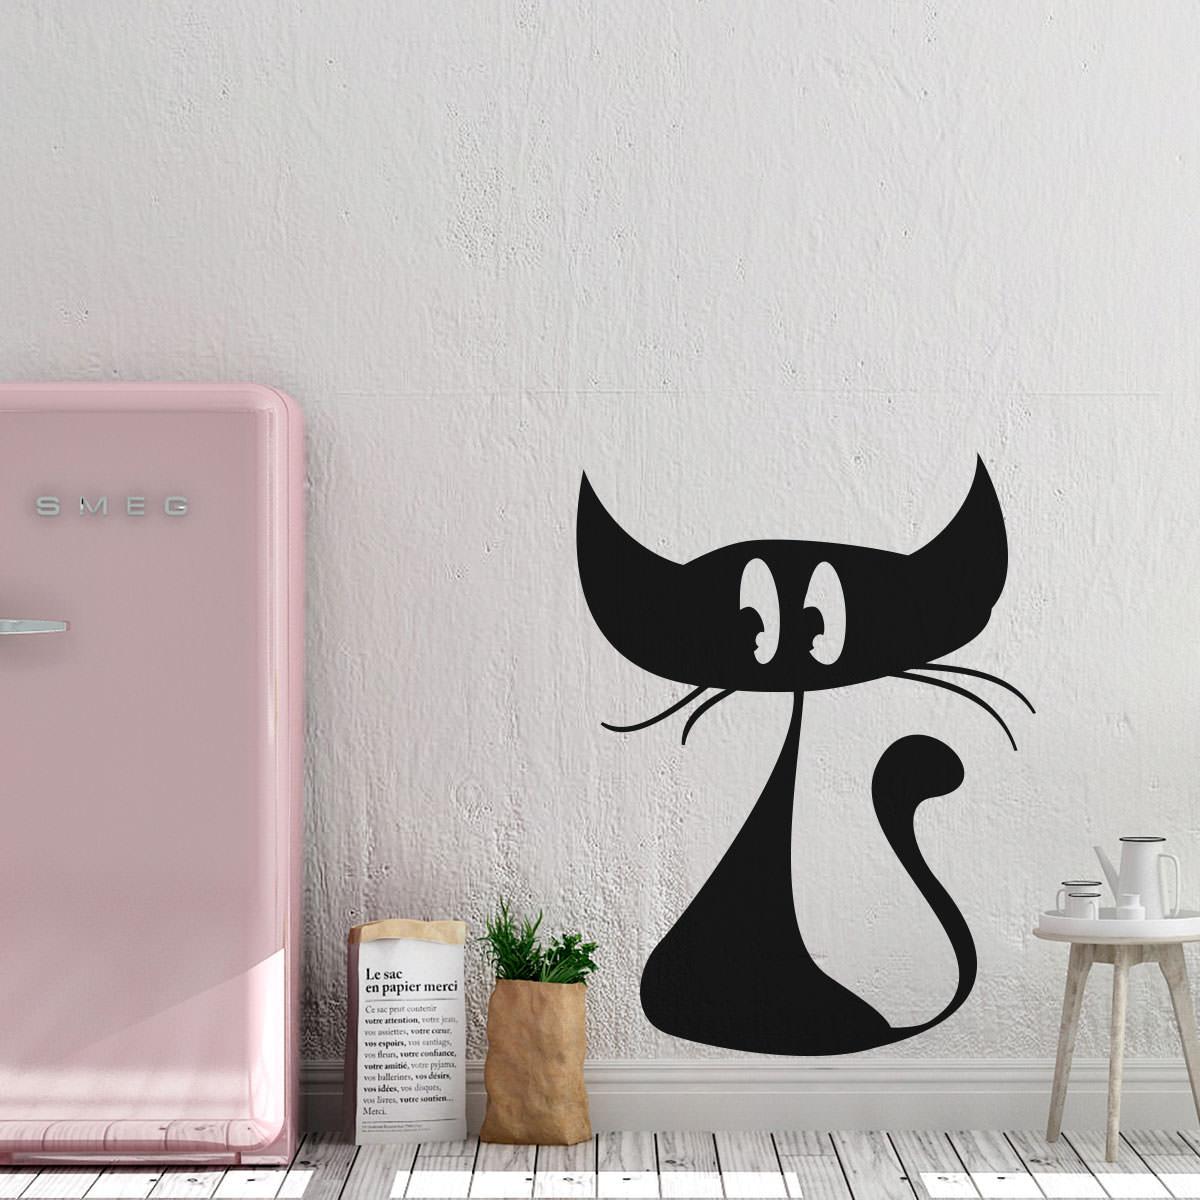 Schön Wandtattoo Katzen Referenz Von 810-wandtattoo-wandaufkleber-katze-cat-1.jpg